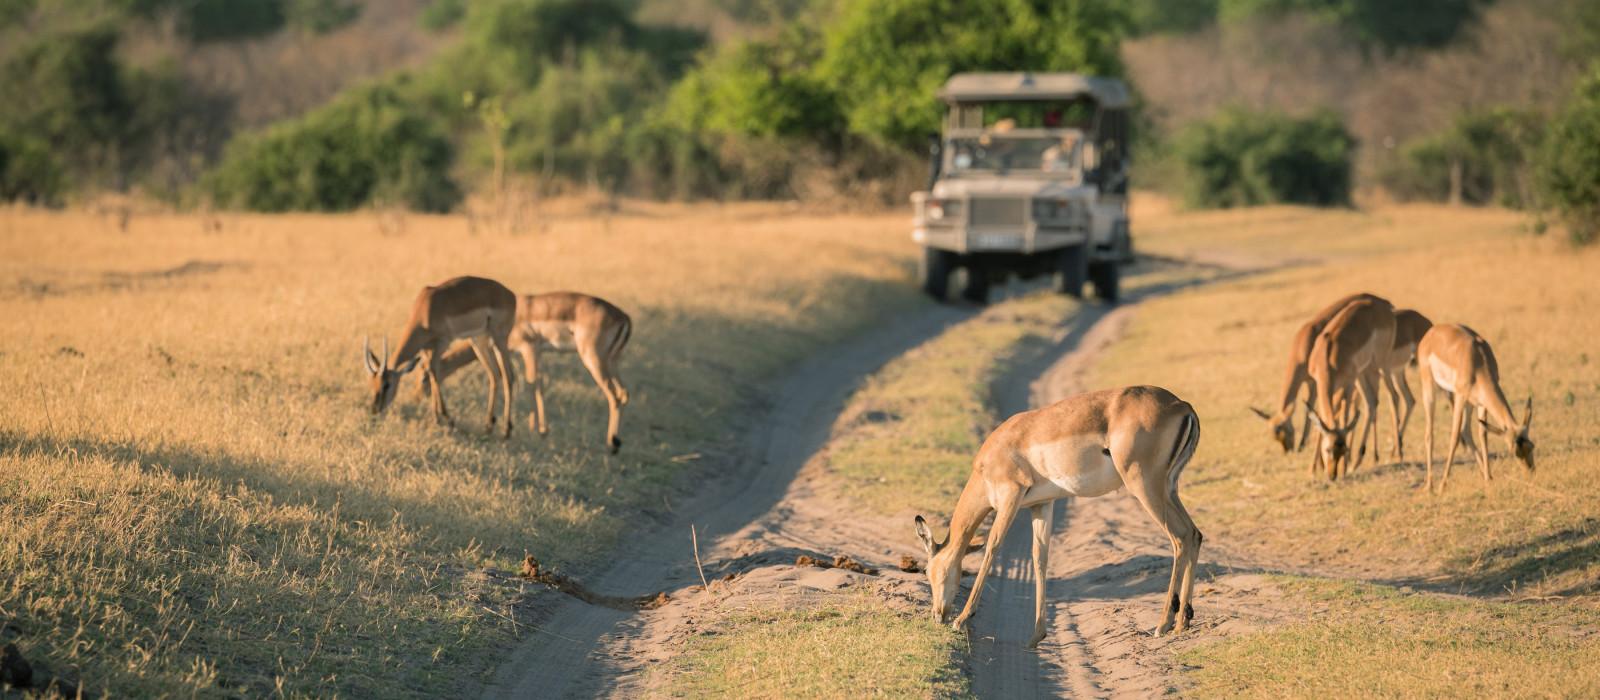 Game Safari, Hirsche, Malawi, Afrika